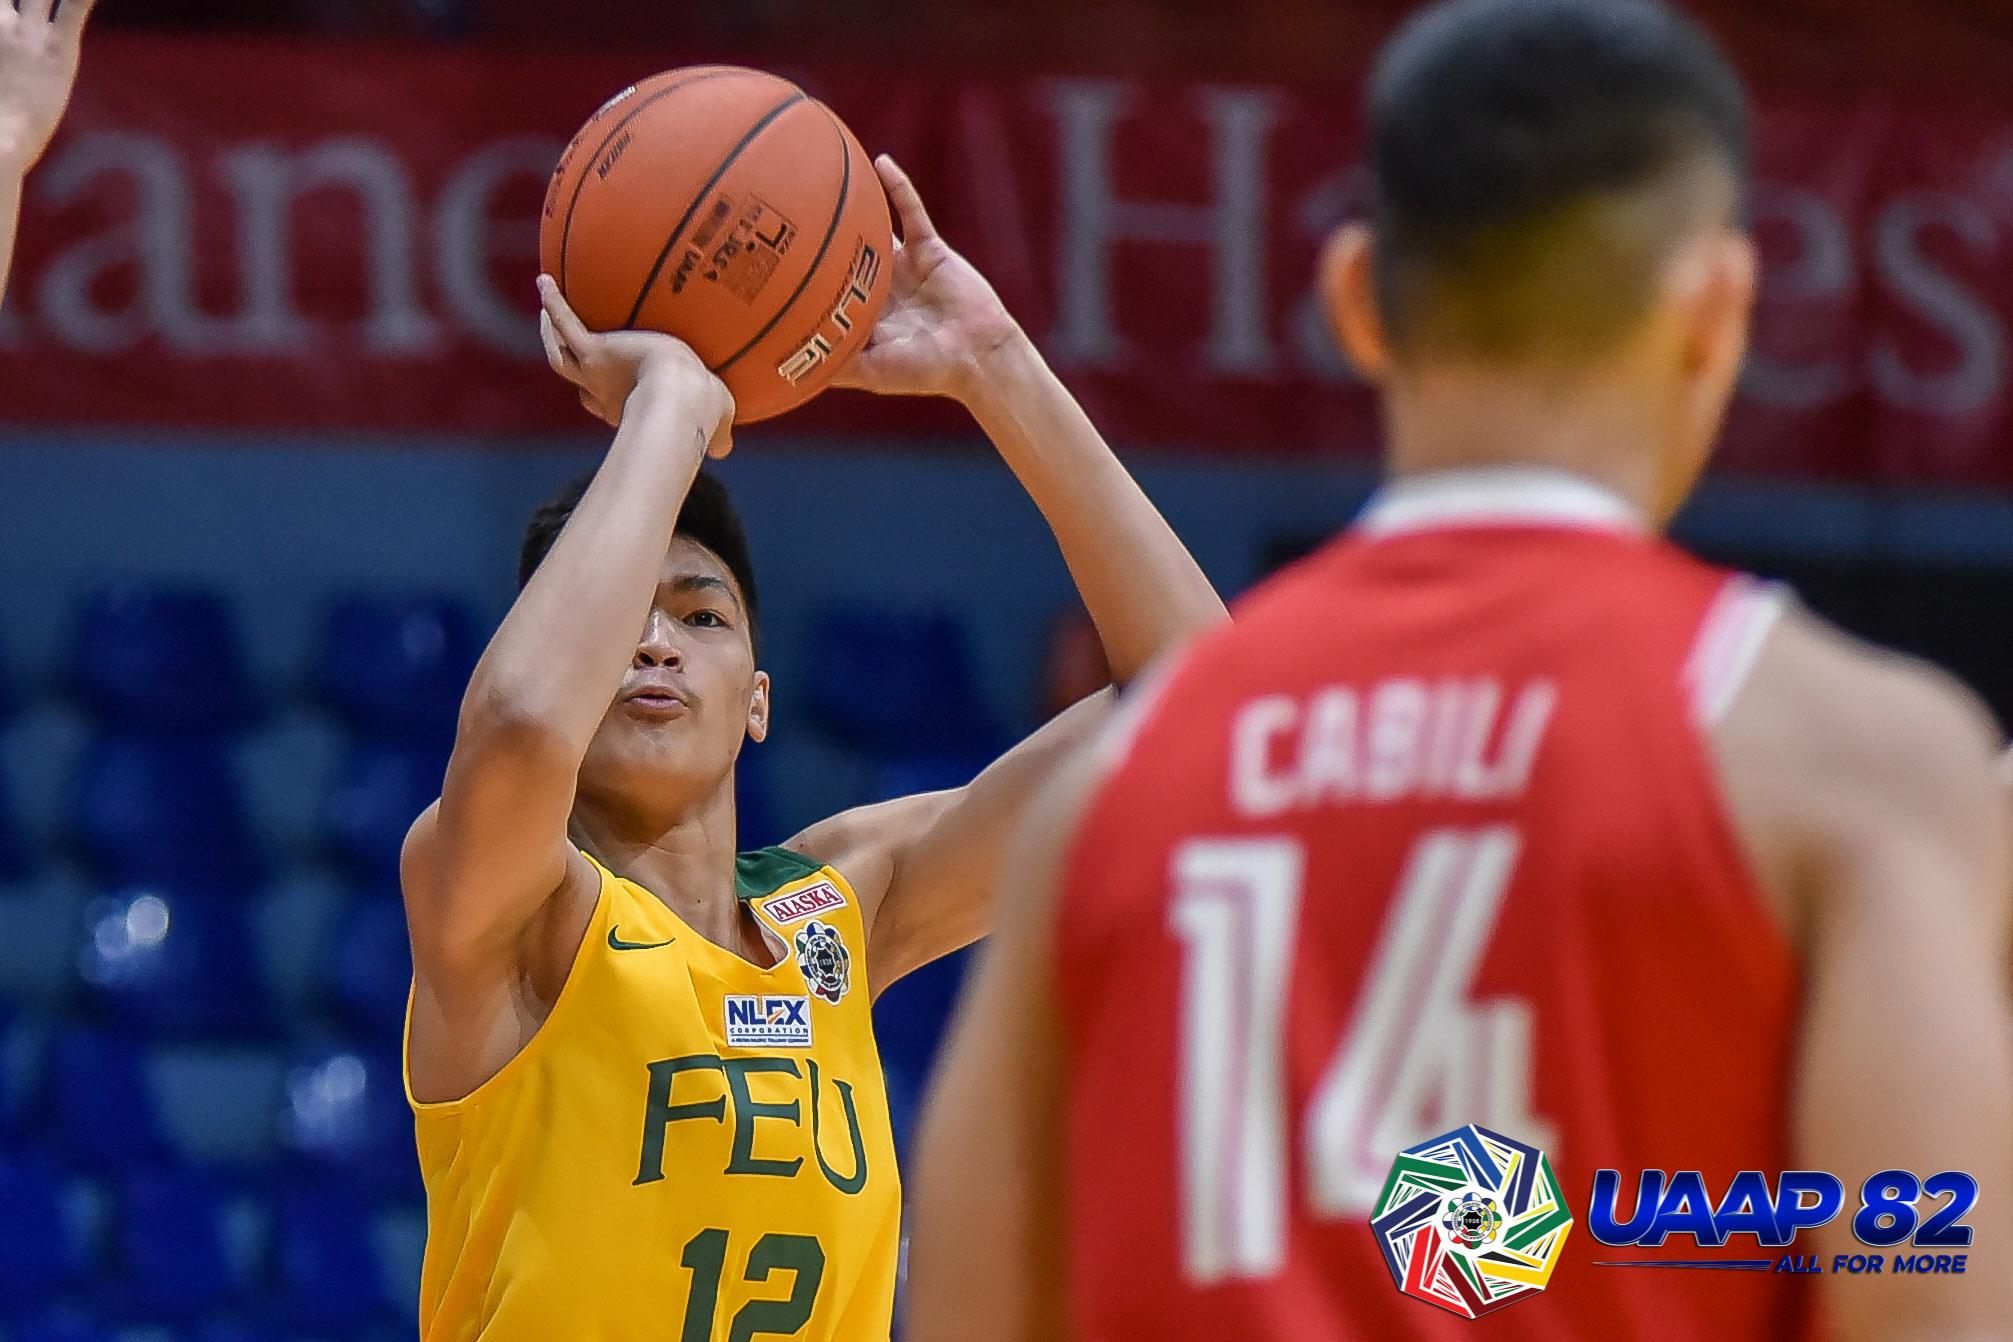 UAAP-82-Jrs-FEU-vs.-UE-Mantua-3519 FEU-D's Royce Mantua commits to UST Basketball News UAAP UST  - philippine sports news